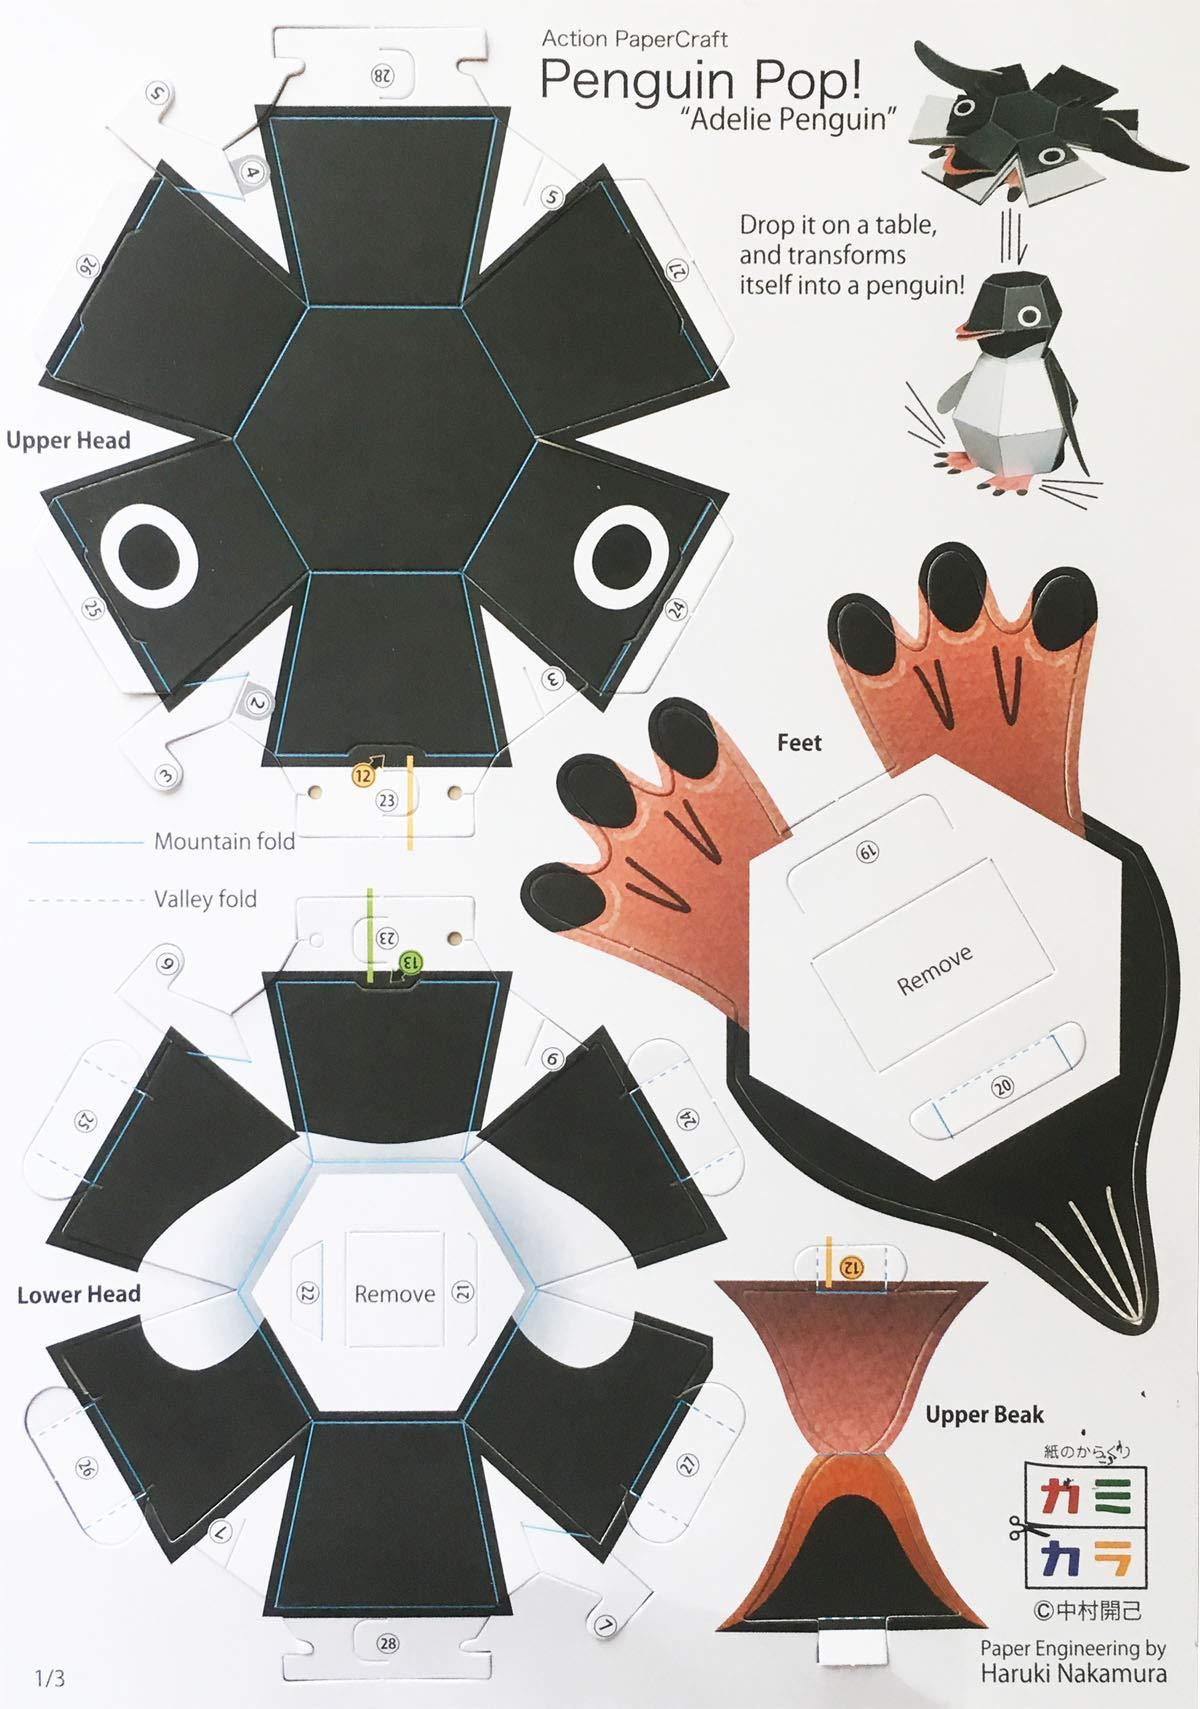 Kamikara Penguin POP! Action Paper Craft kit by Haruki Nakamura by Magnote